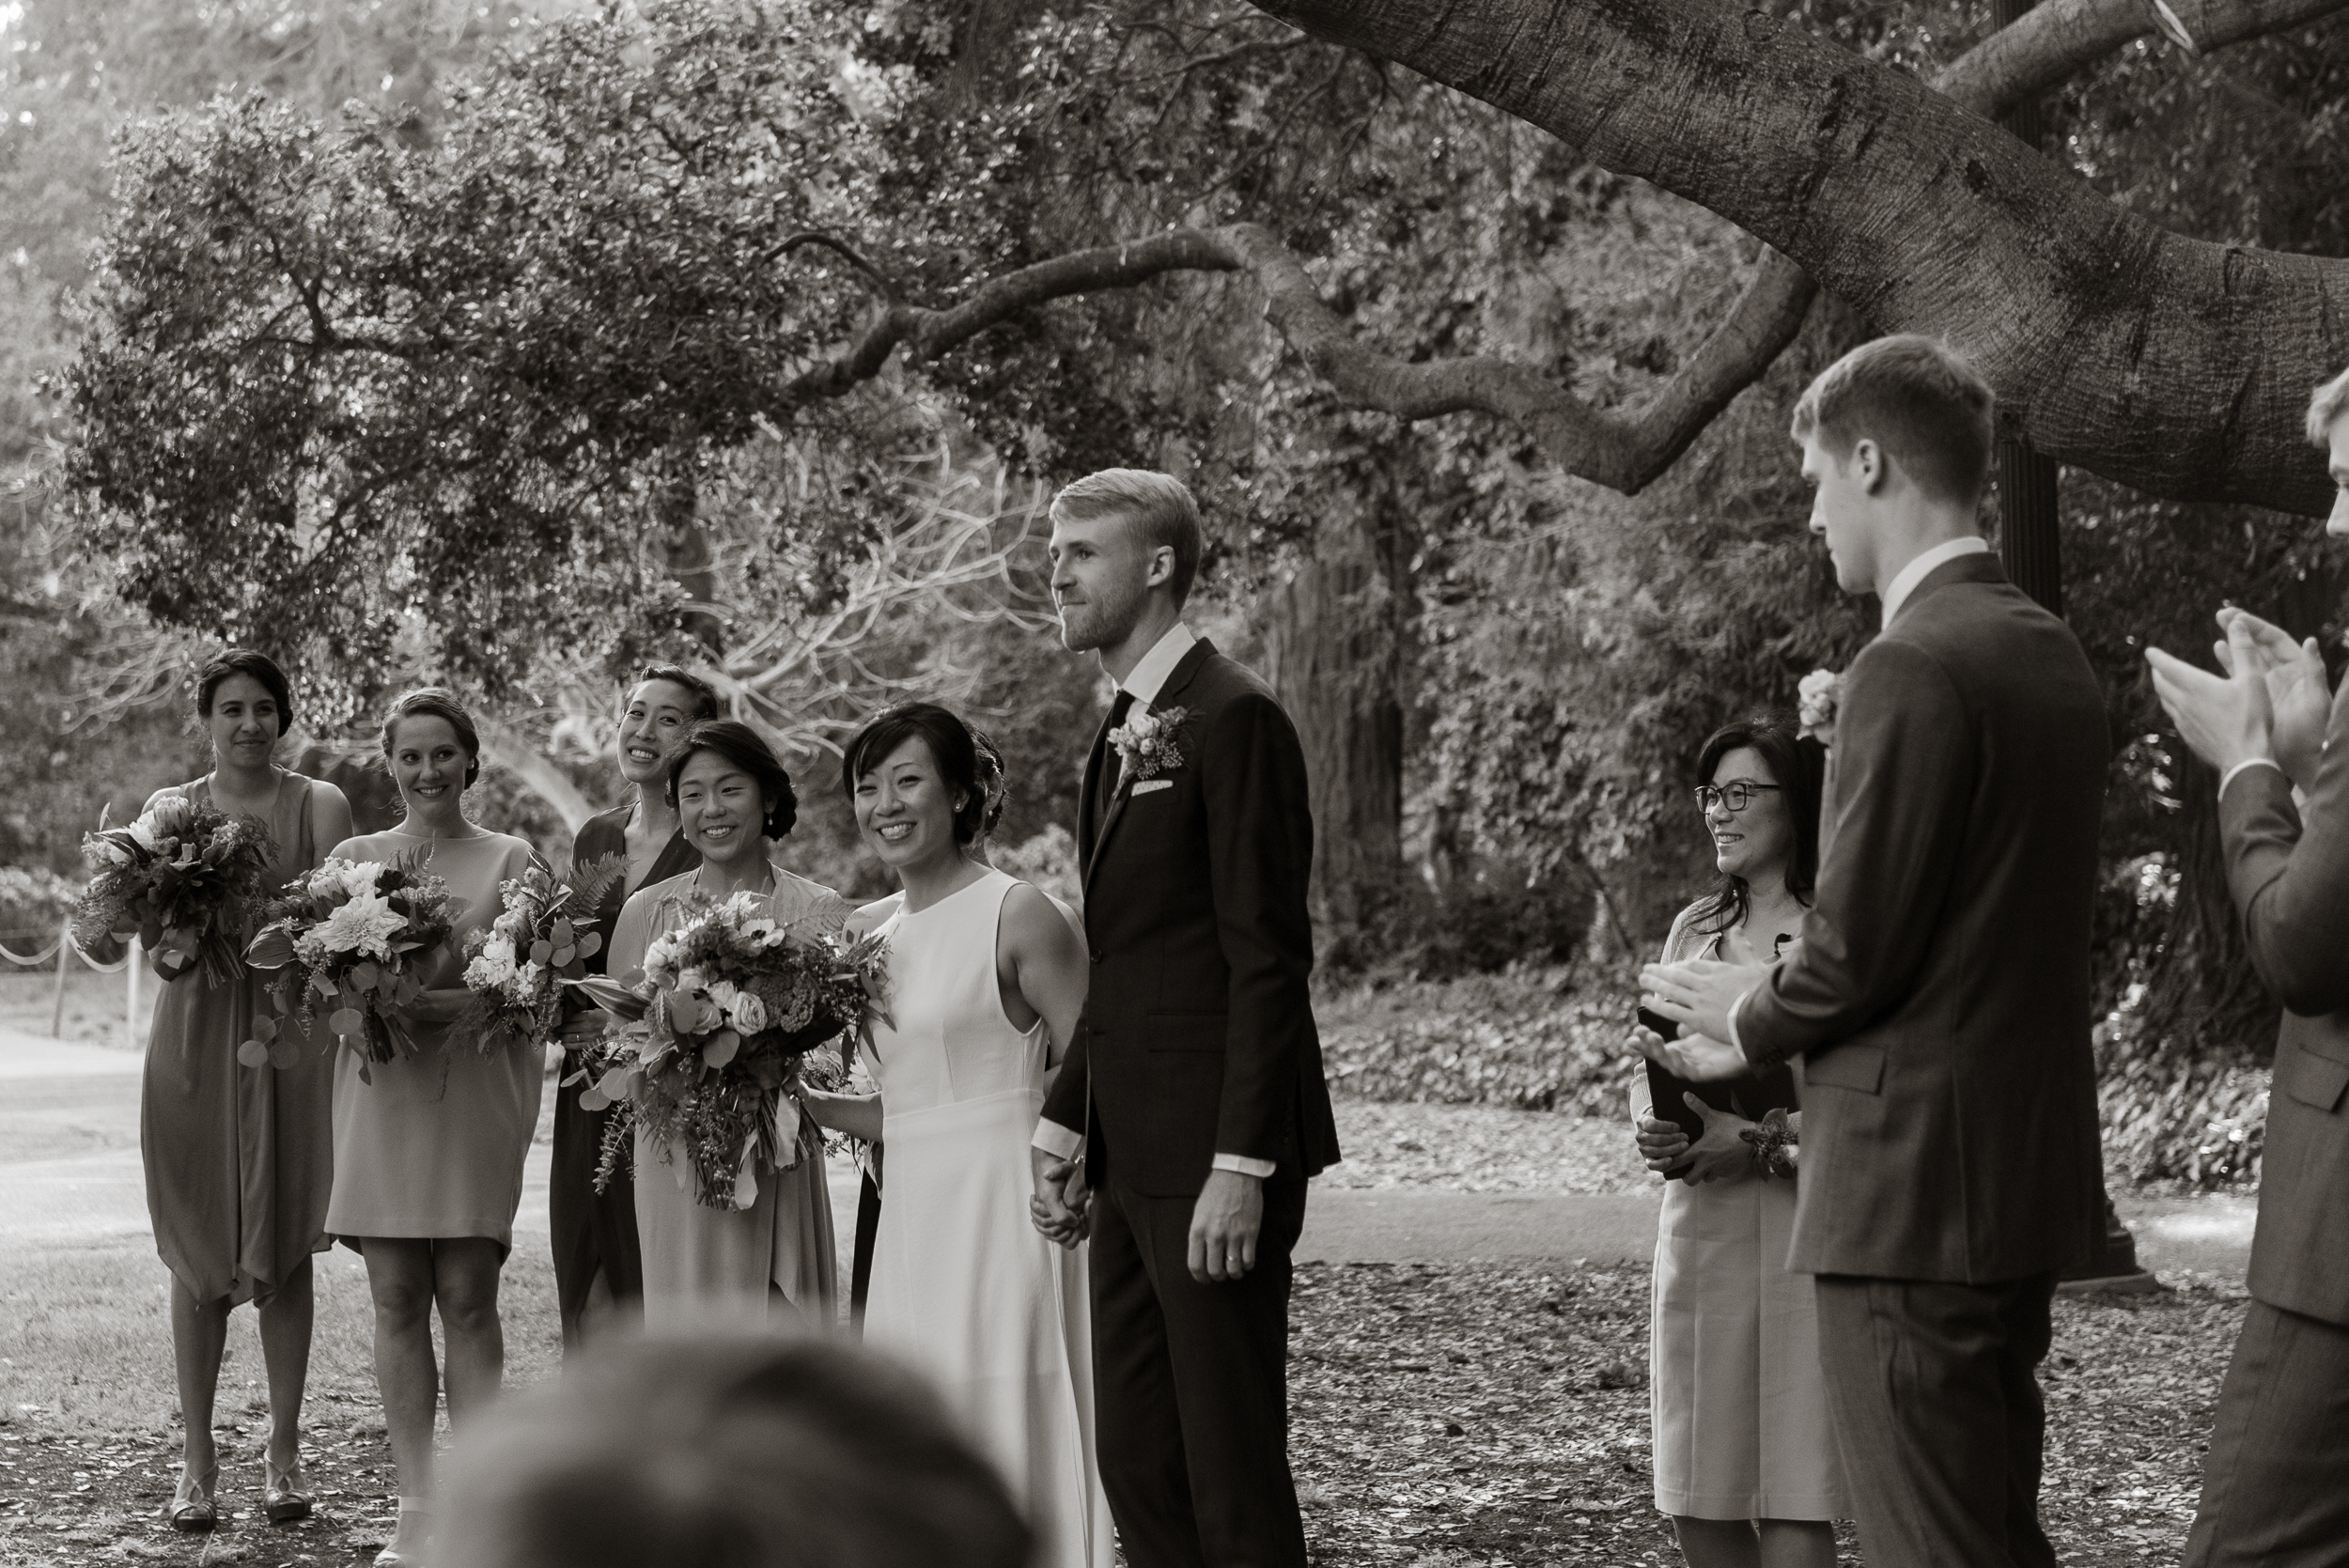 faculty-club-berkeley-wedding-photographer-vc041.jpg